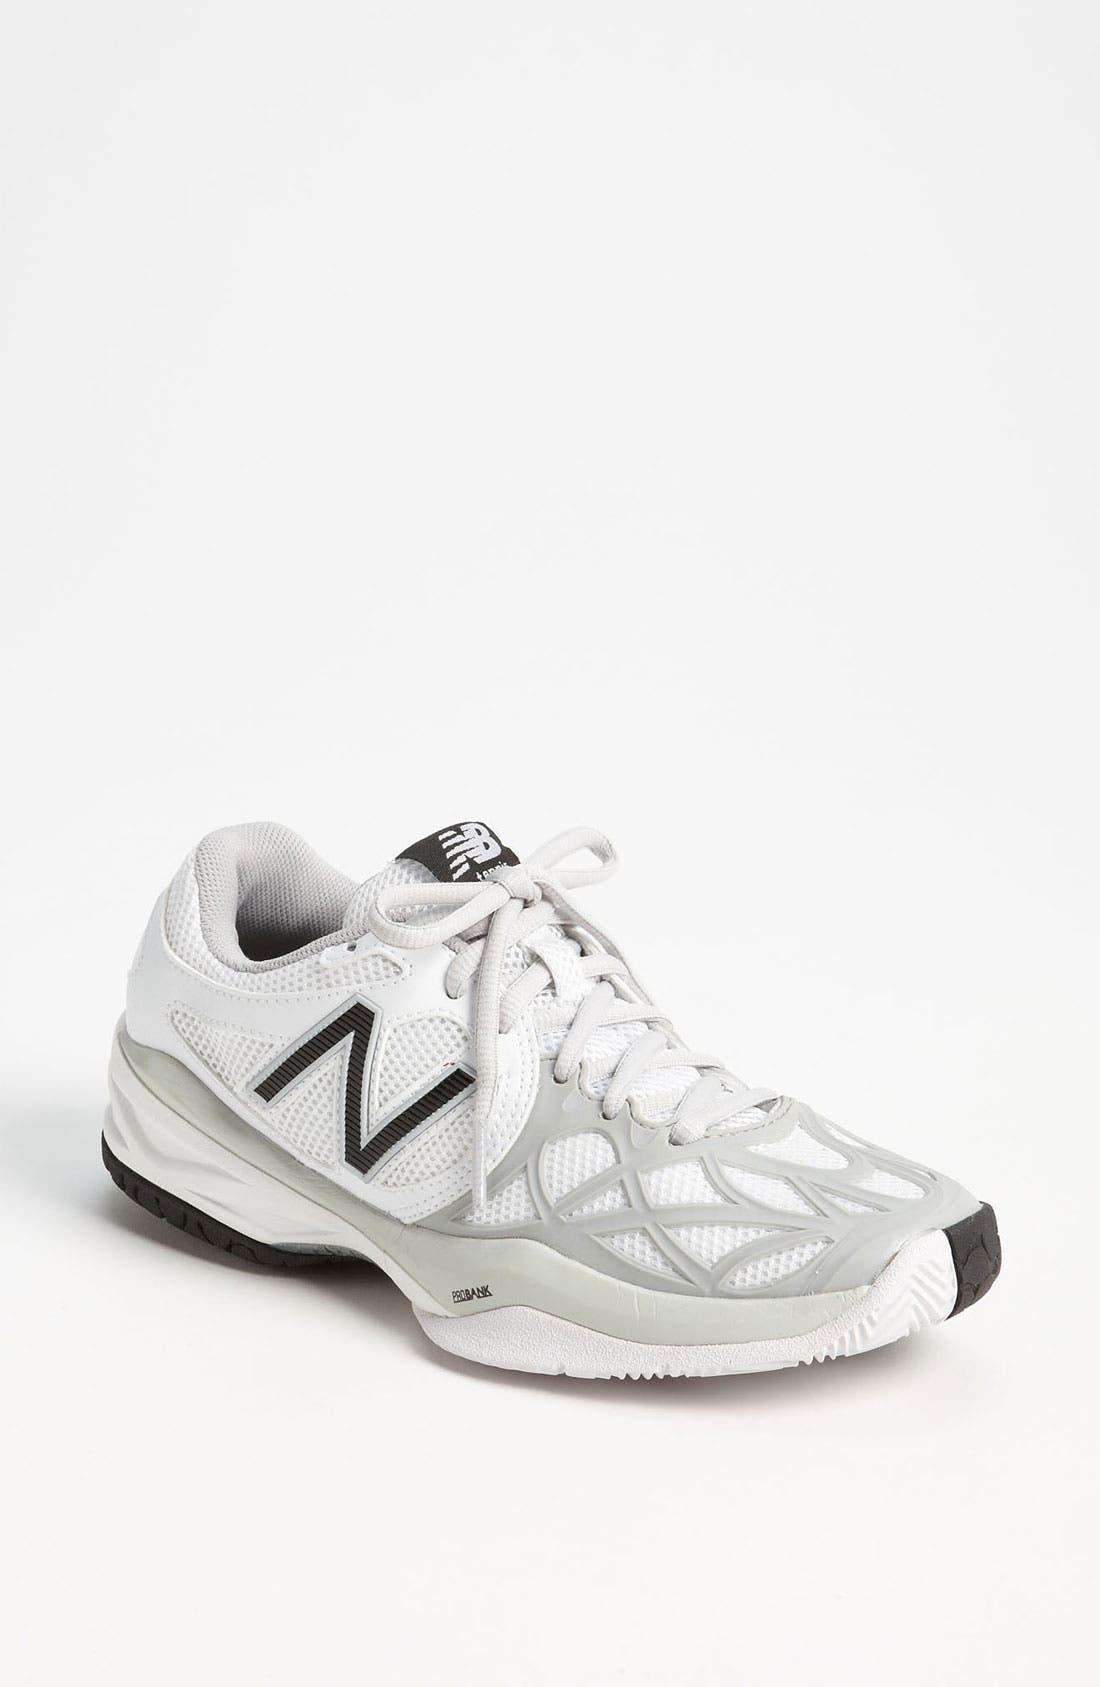 Alternate Image 1 Selected - New Balance '996' Tennis Shoe (Women)